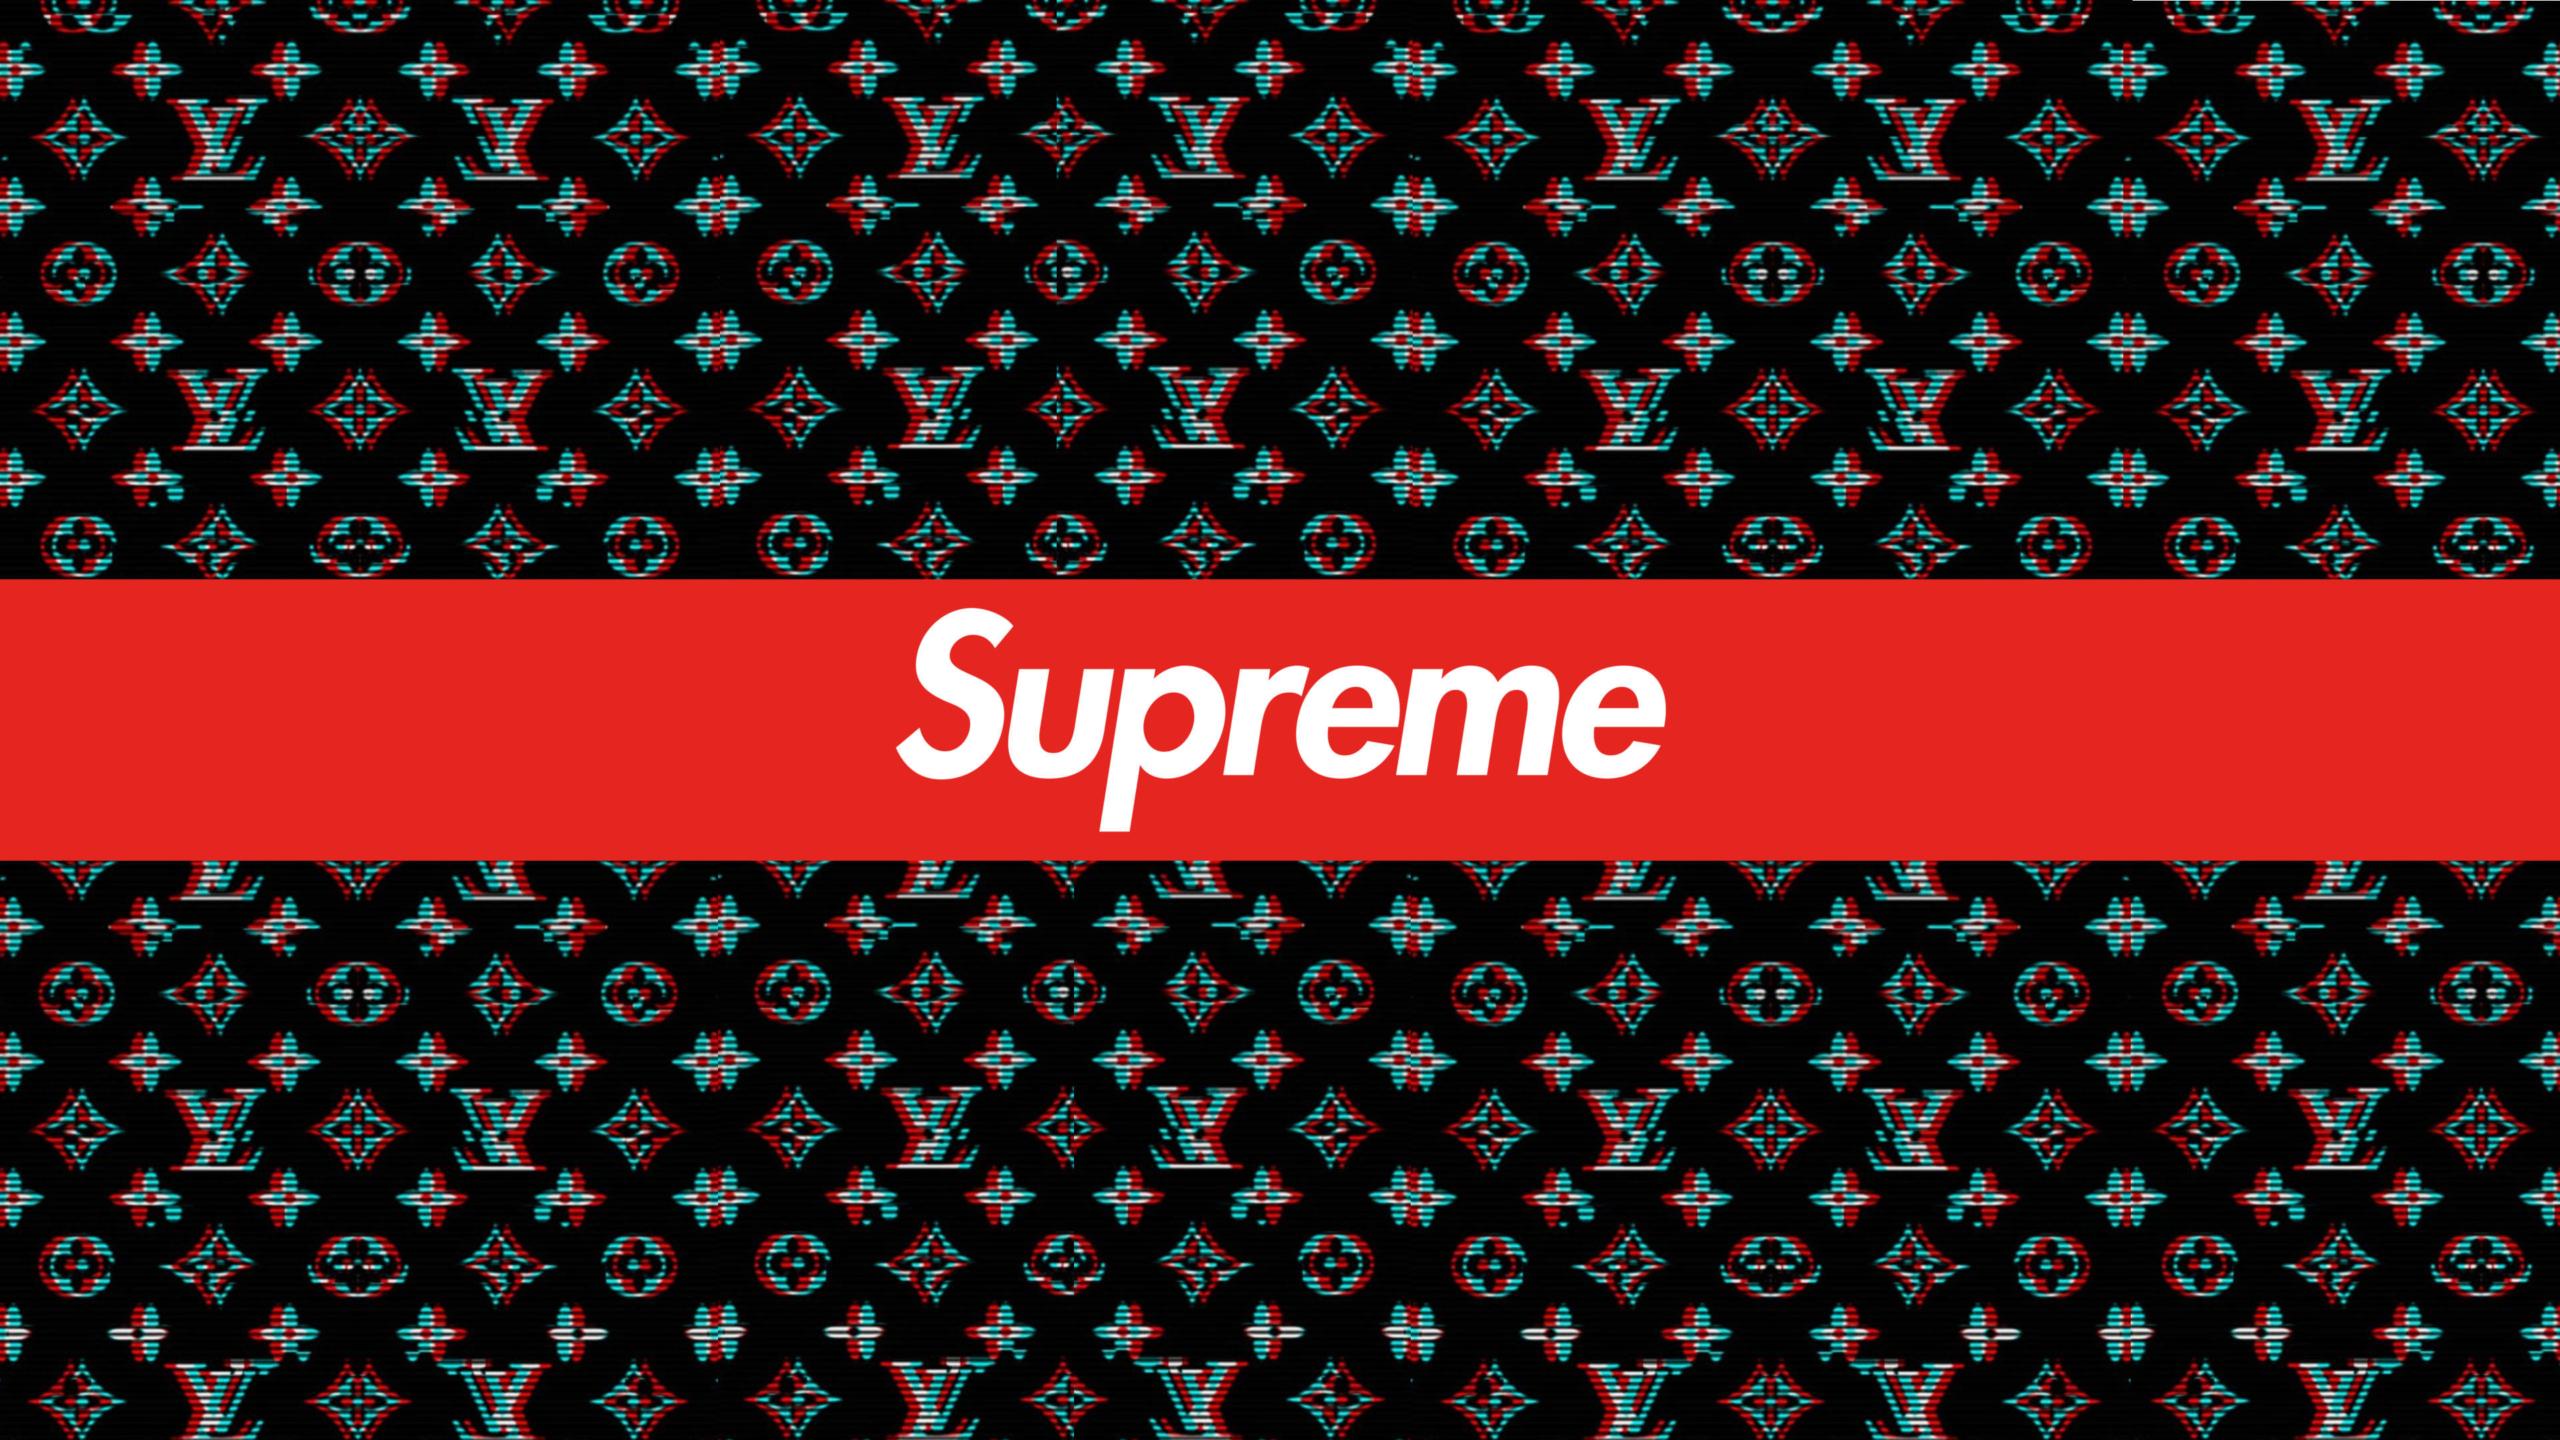 80 Supreme Wallpaper Hd That You Like Clear Wallpaper